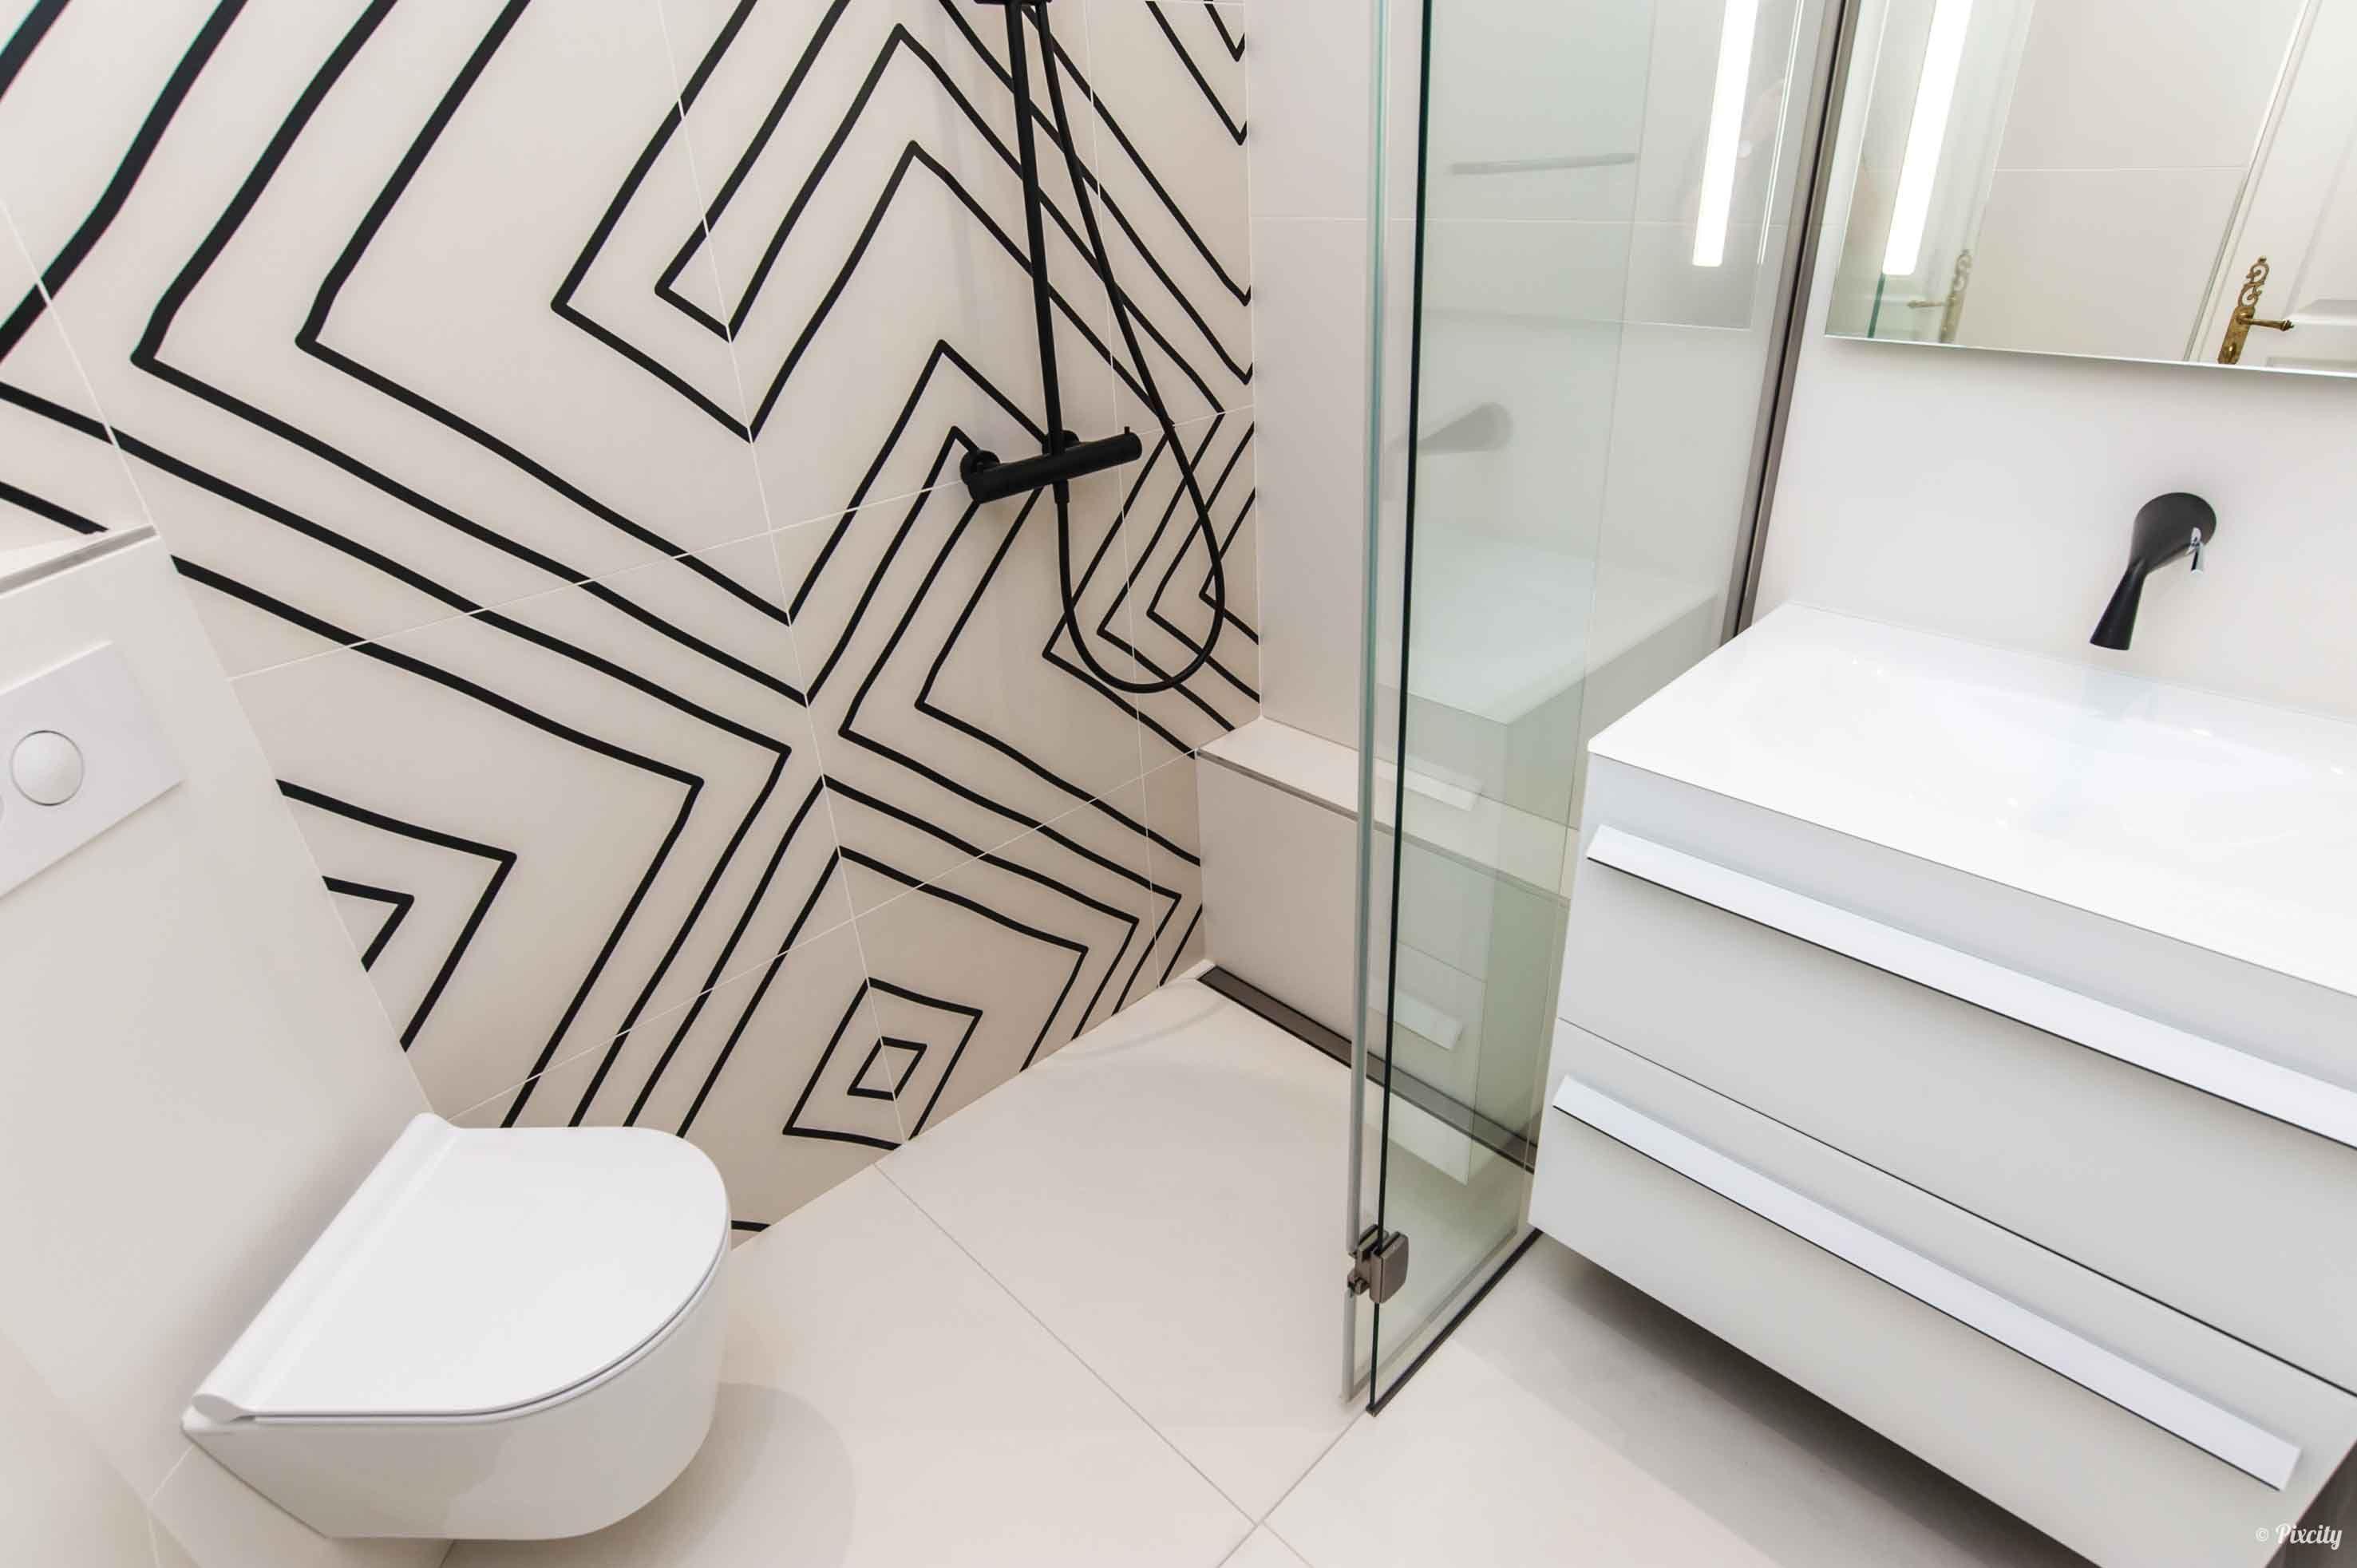 Petite Salle De Bain De 2 5m2 Small Bathroom Remodel Home Decor Decals Small Remodel